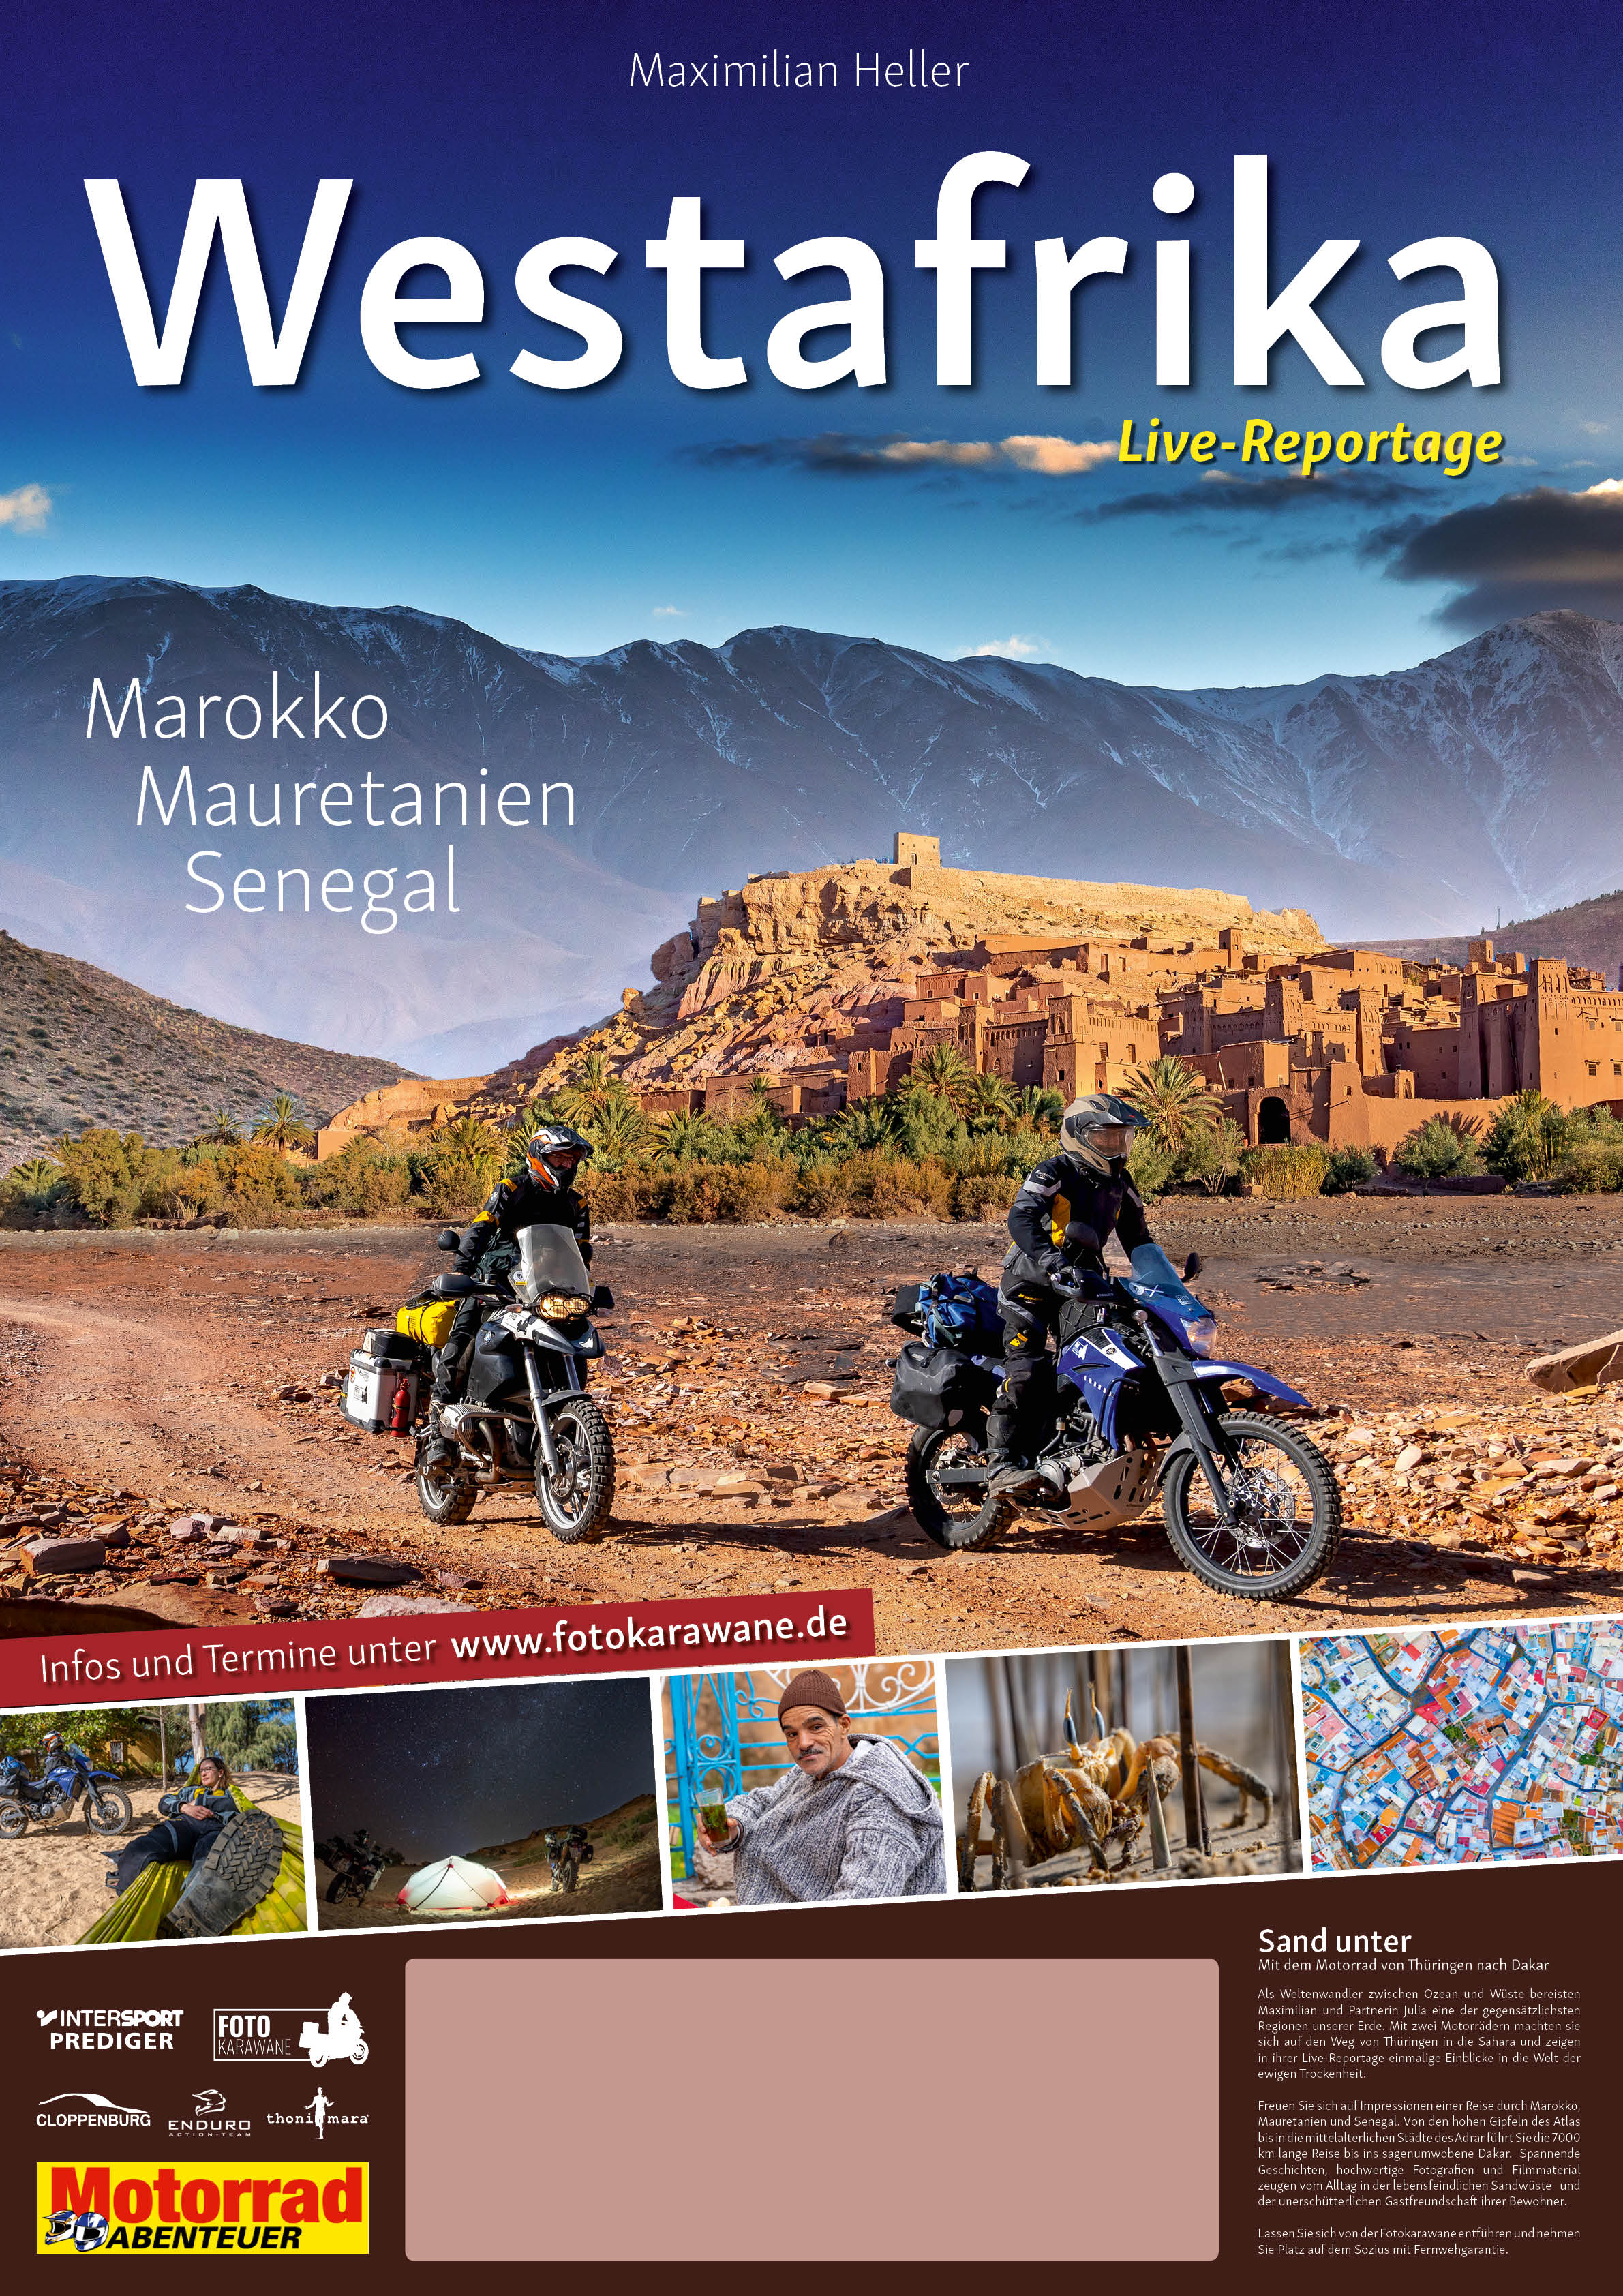 Plakat-Multivision-Westafrika-Maximilian-Heller